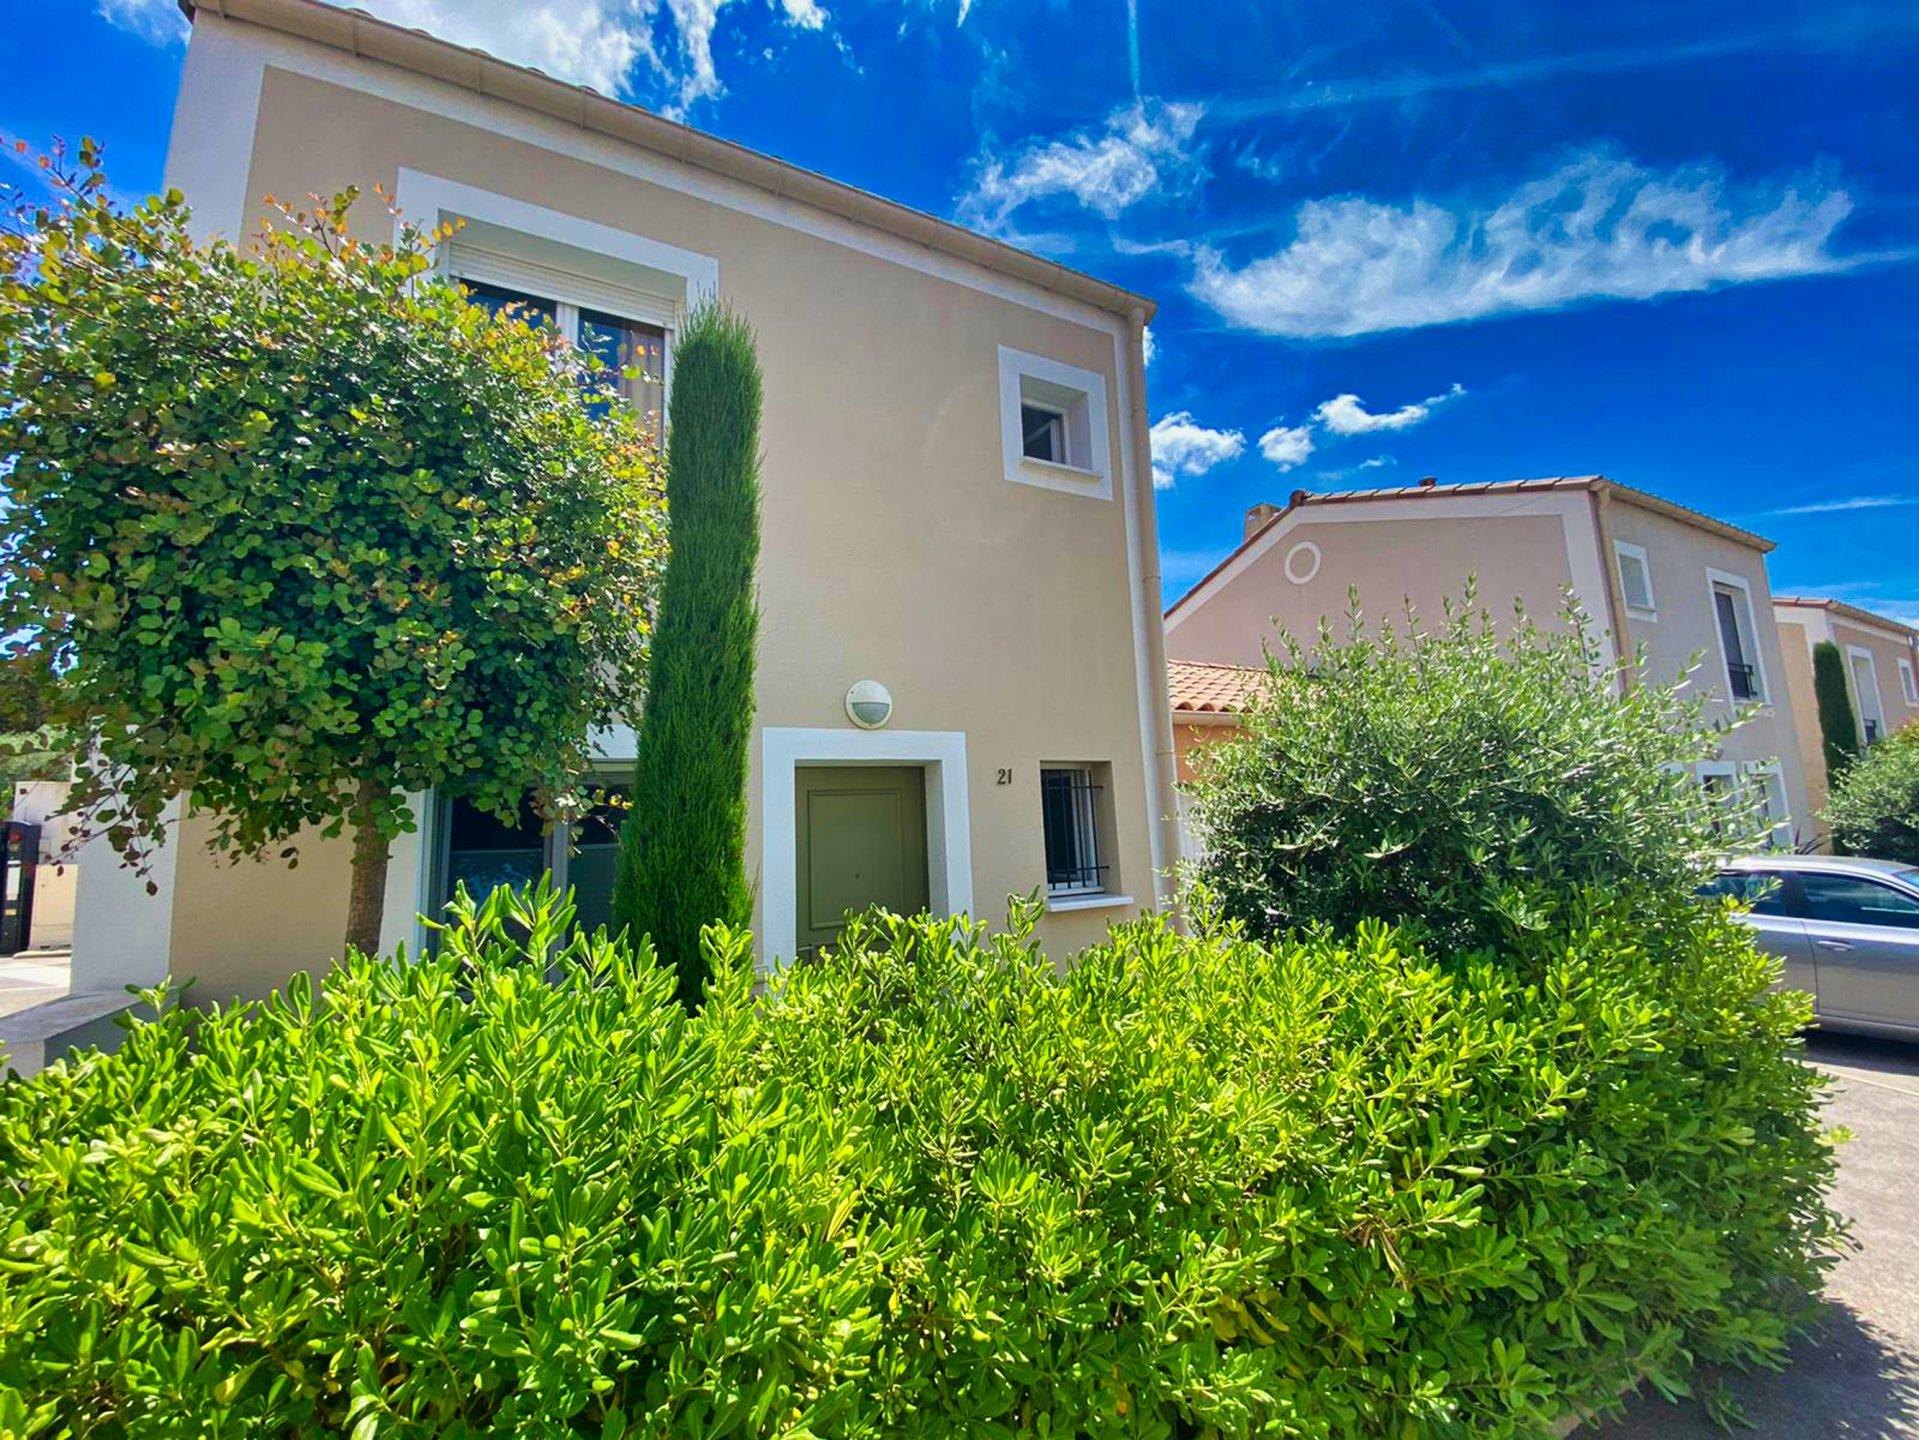 VENDU ! villa 3P 68 m² avec jardin privatif et garage